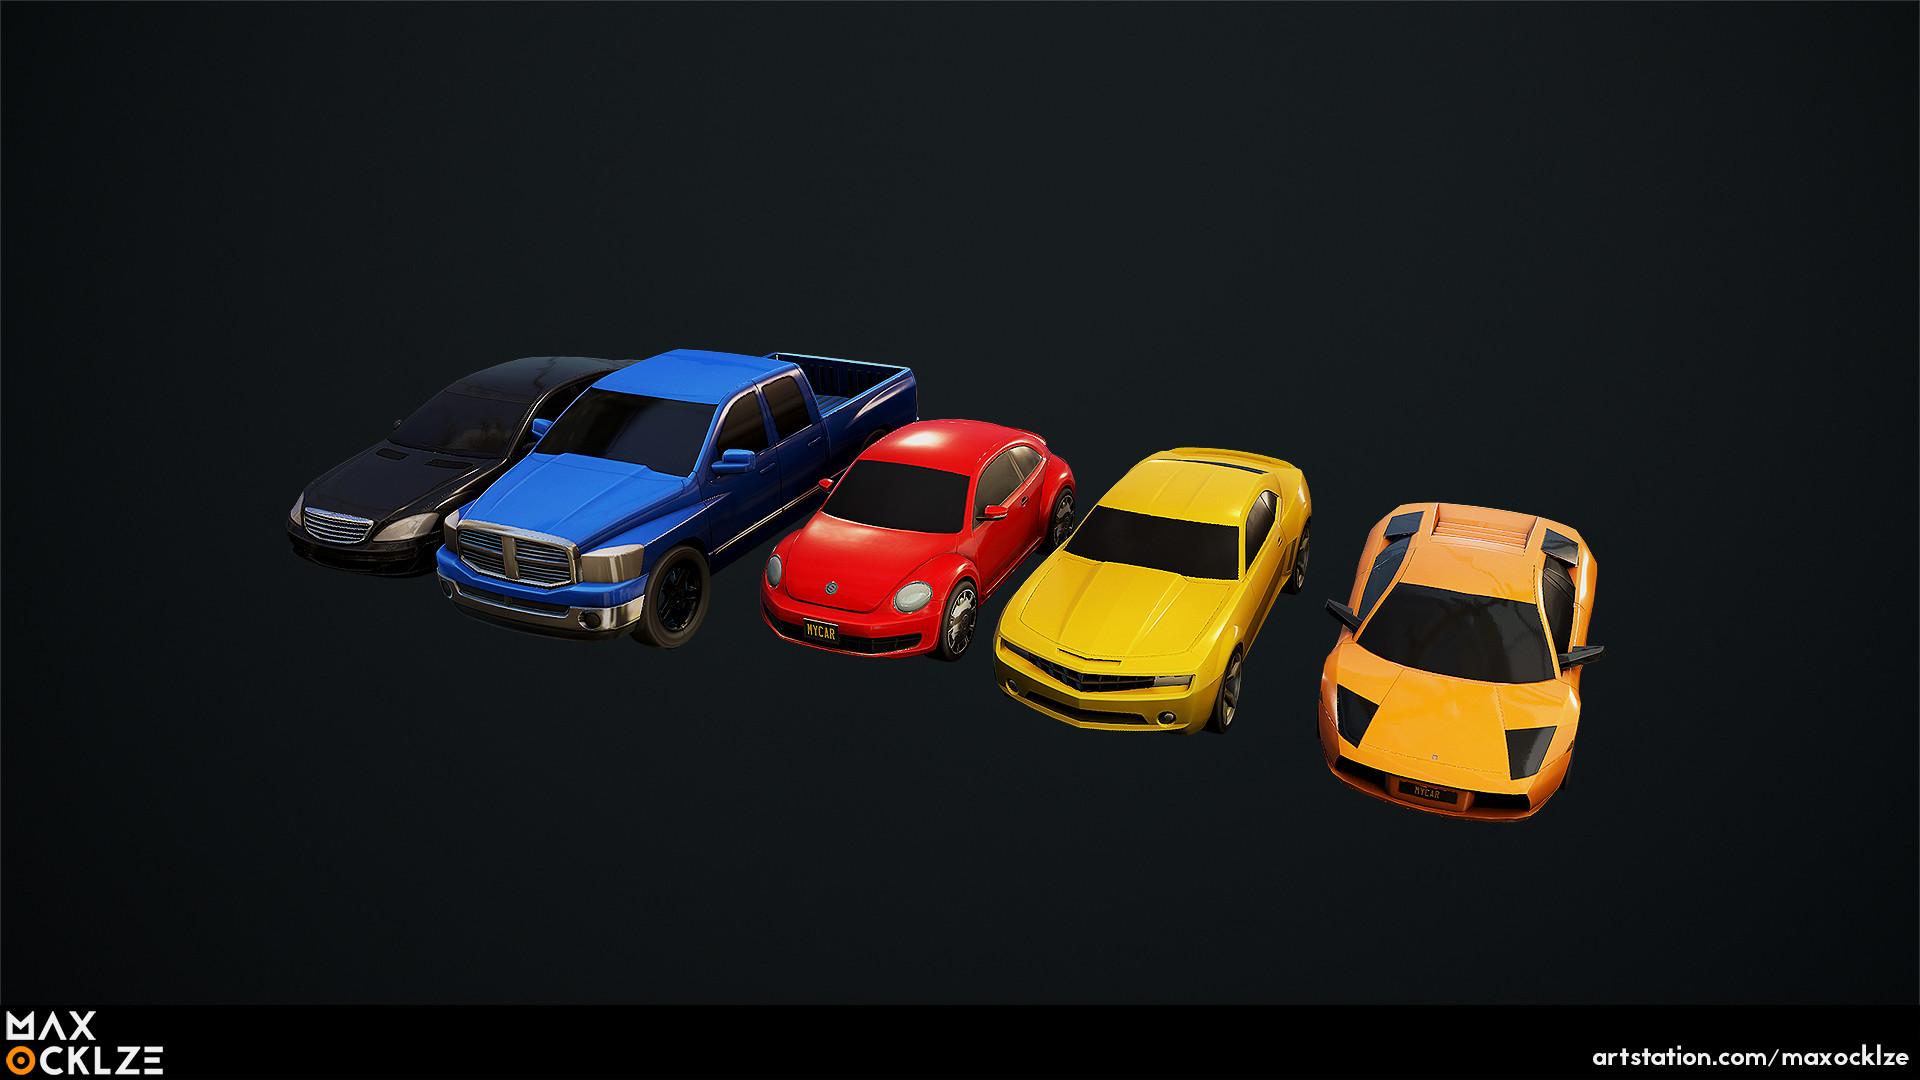 Max ocklze cars 2